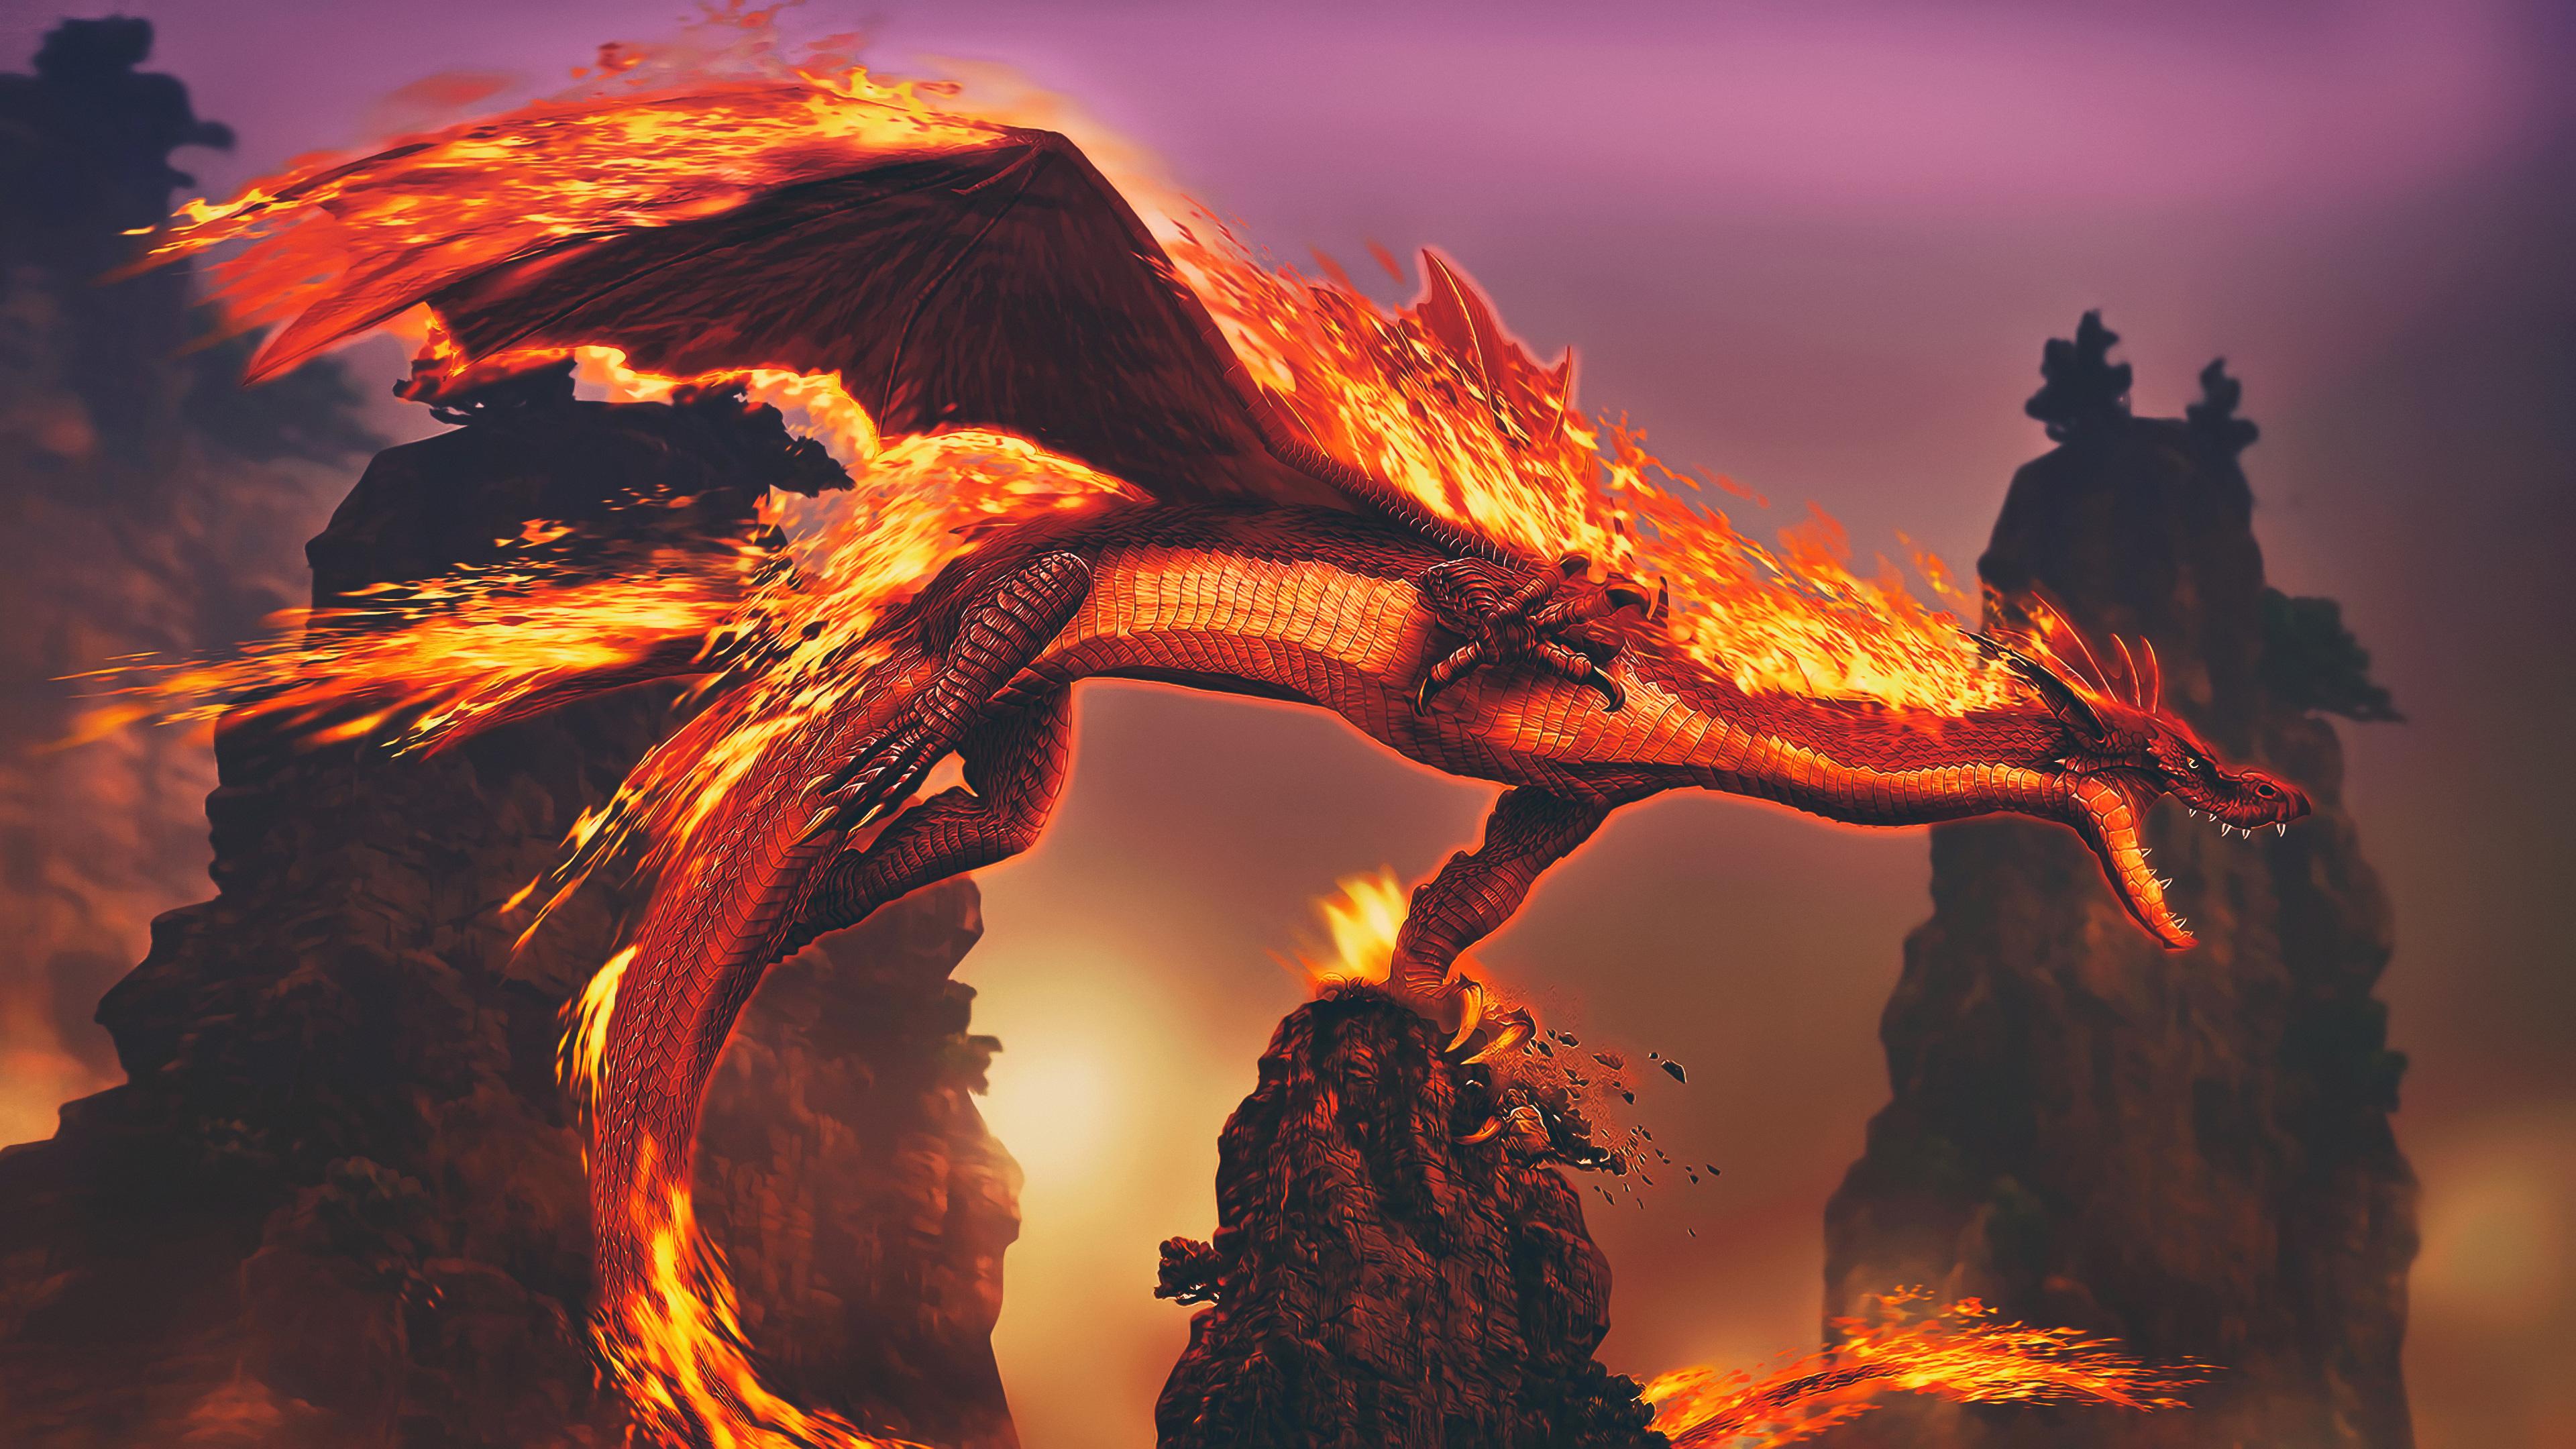 Dragon Fire 4k Hd Artist 4k Wallpapers Images